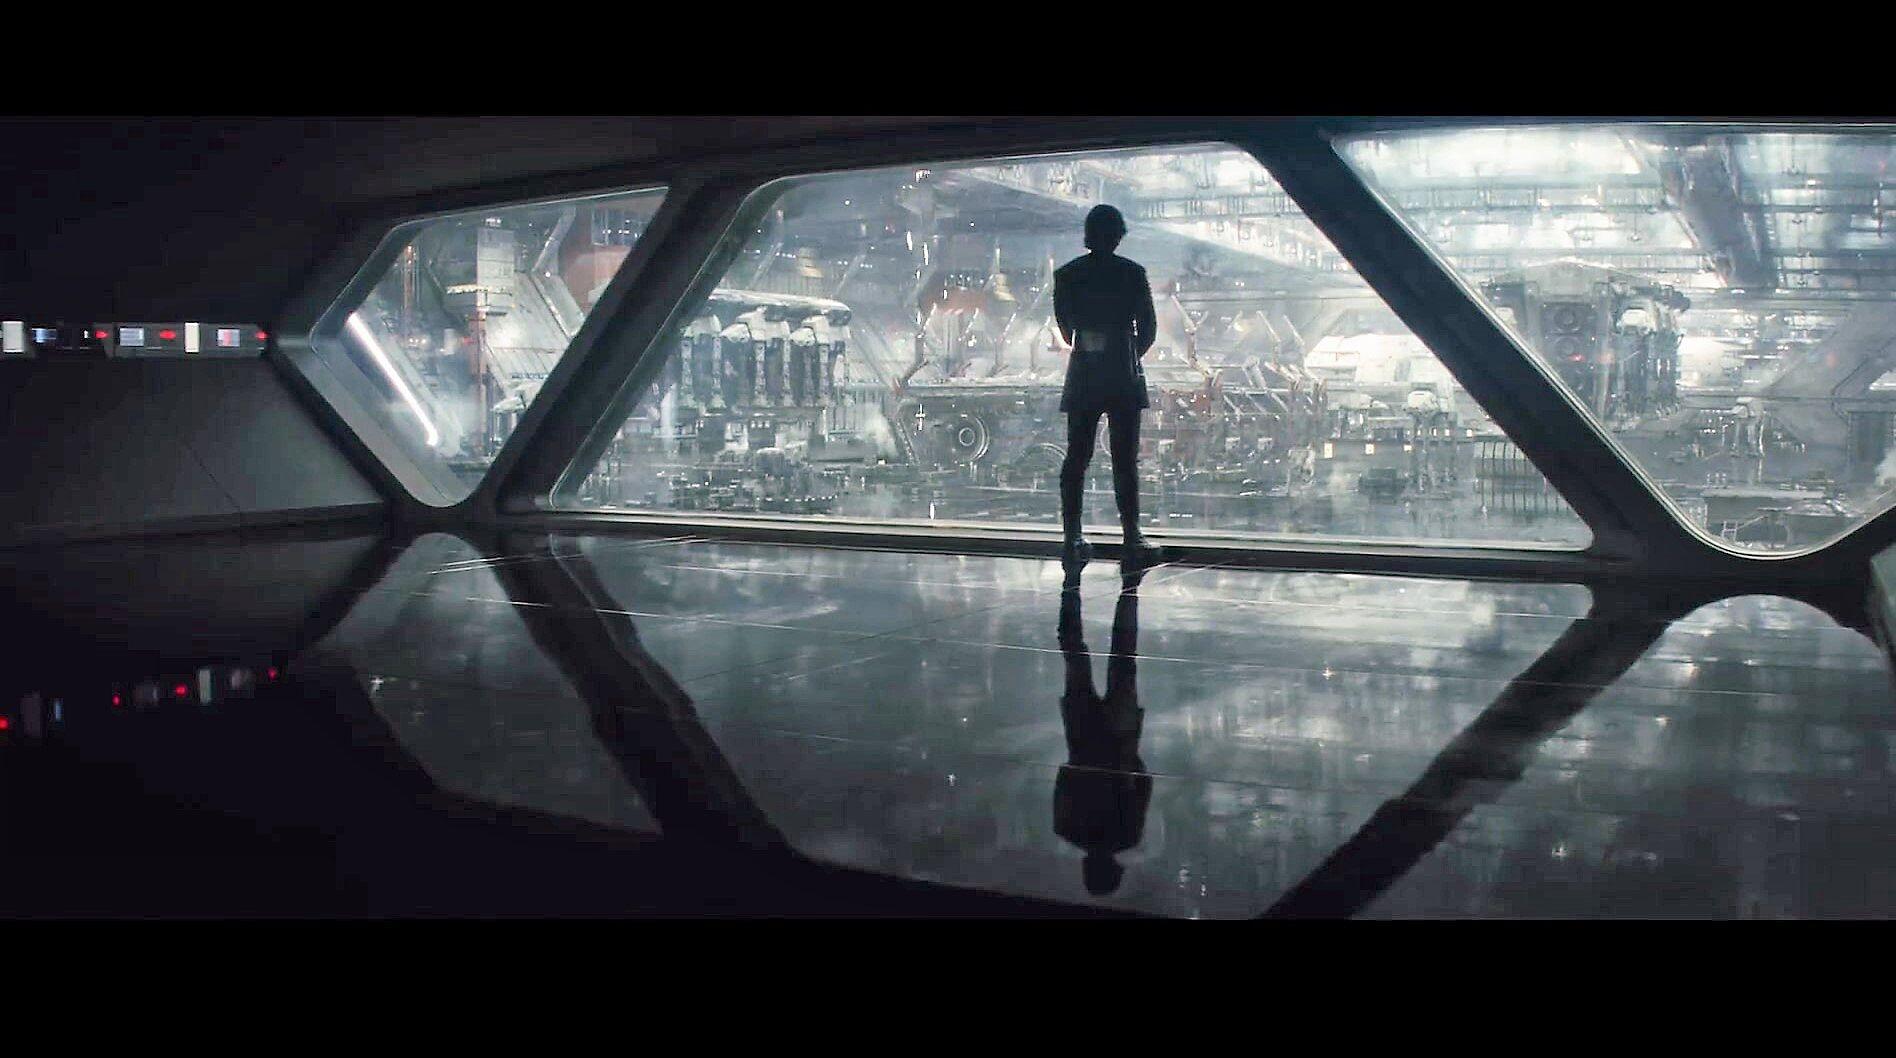 We dissect The Last Jedi trailer in our screencap breakdown